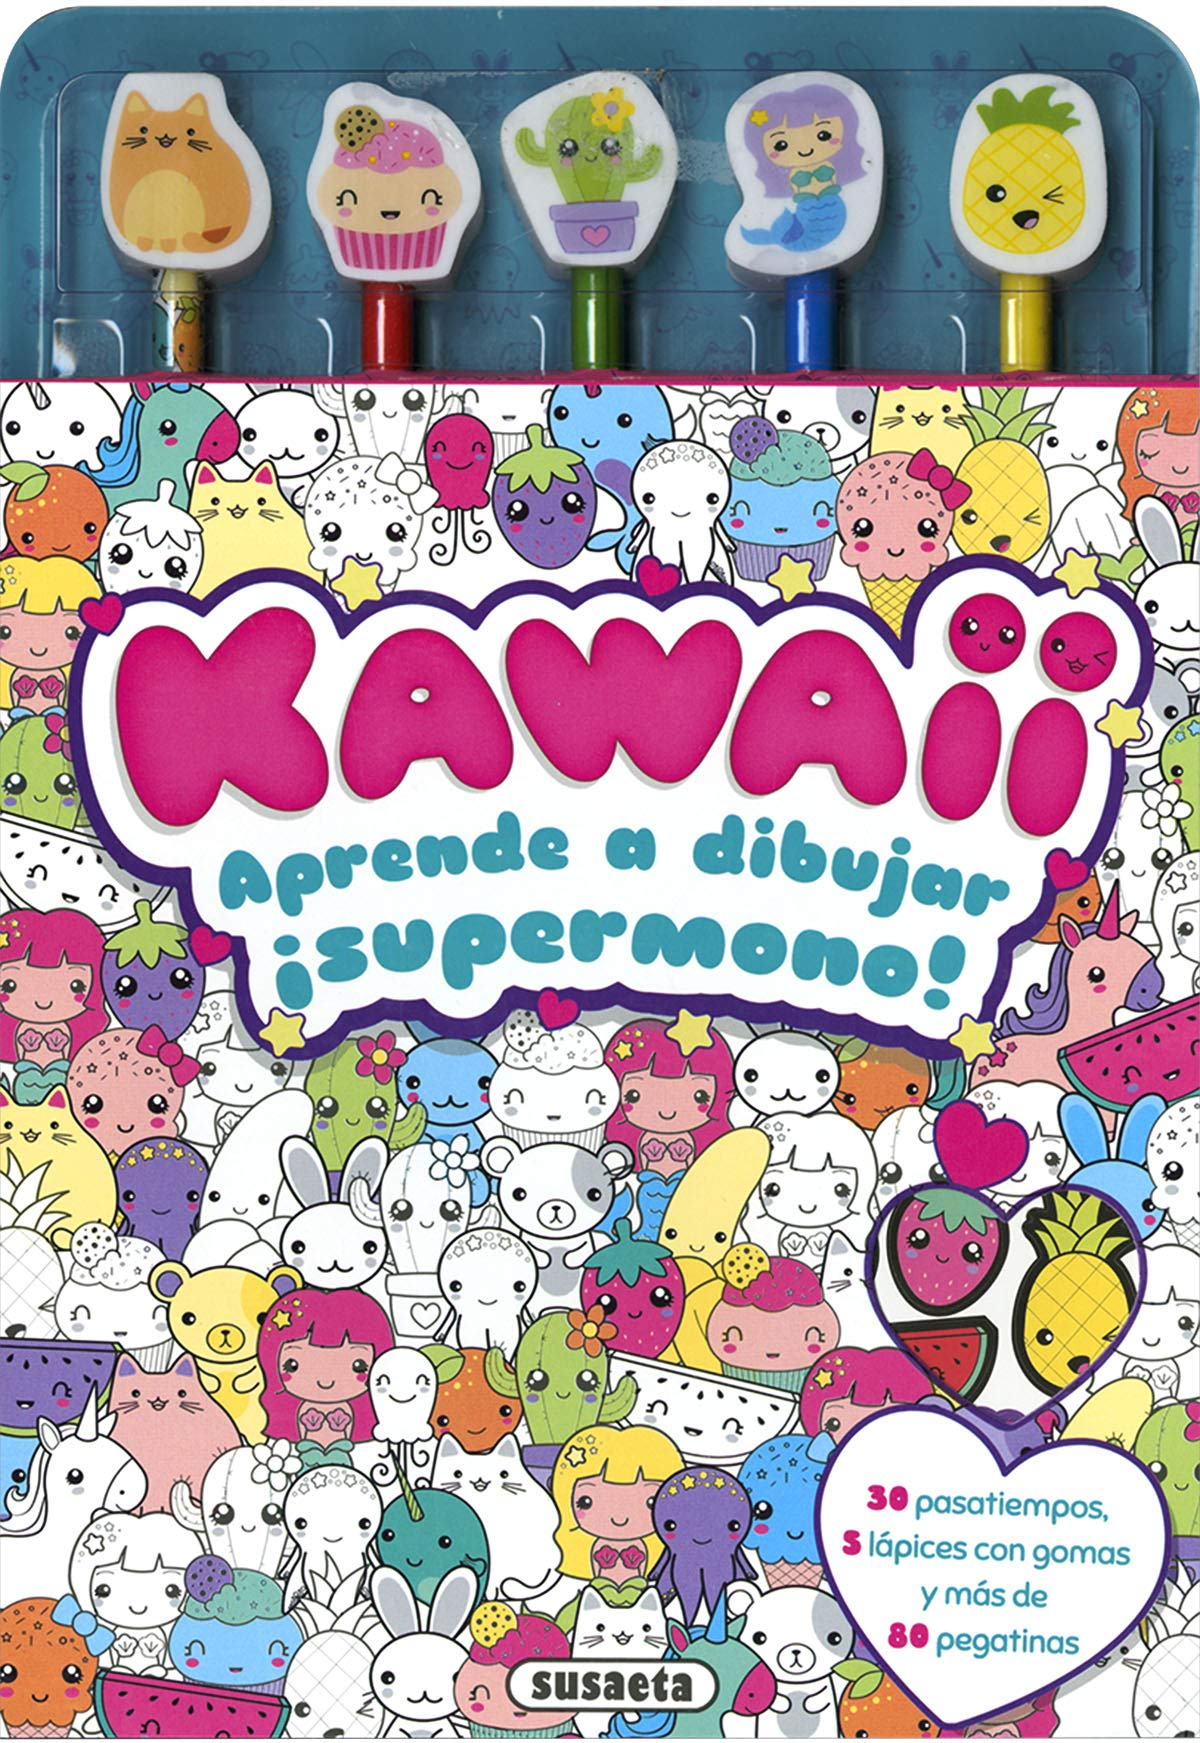 Kawaii Aprende A Dibujar Colorea Y Aprende A Dibujar Amazon Es